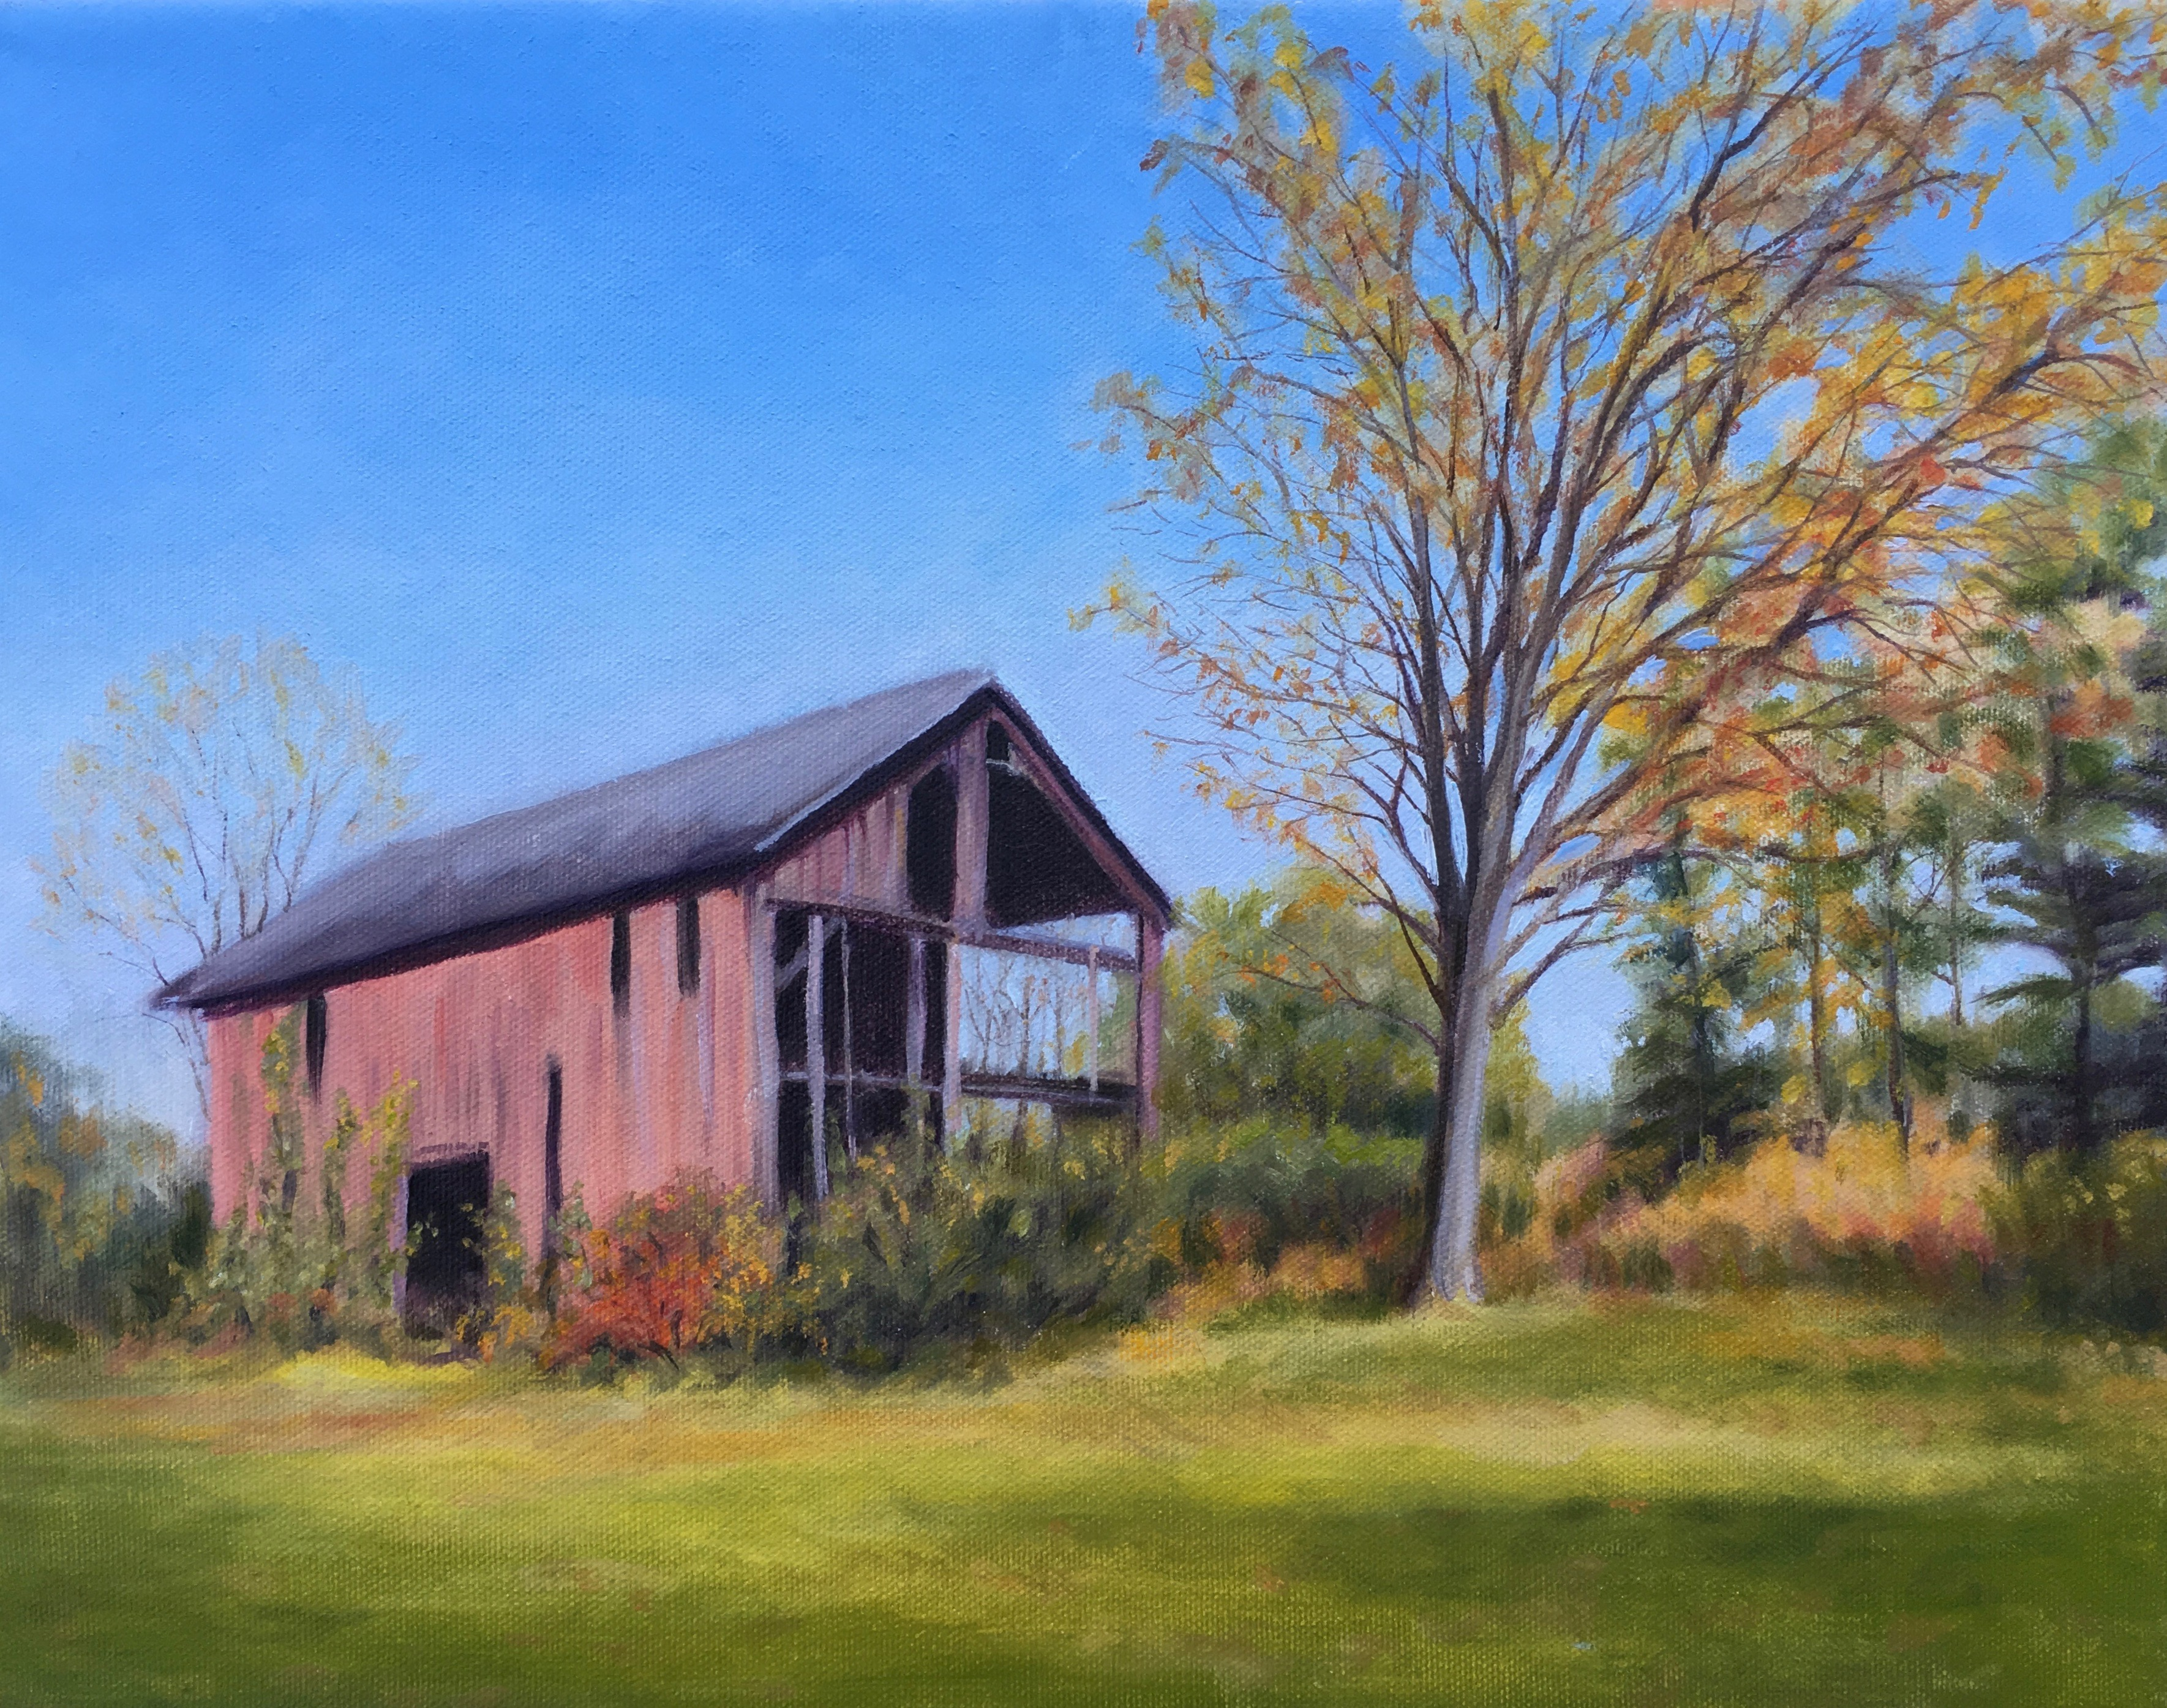 Old Red Barn - Pat Tanger